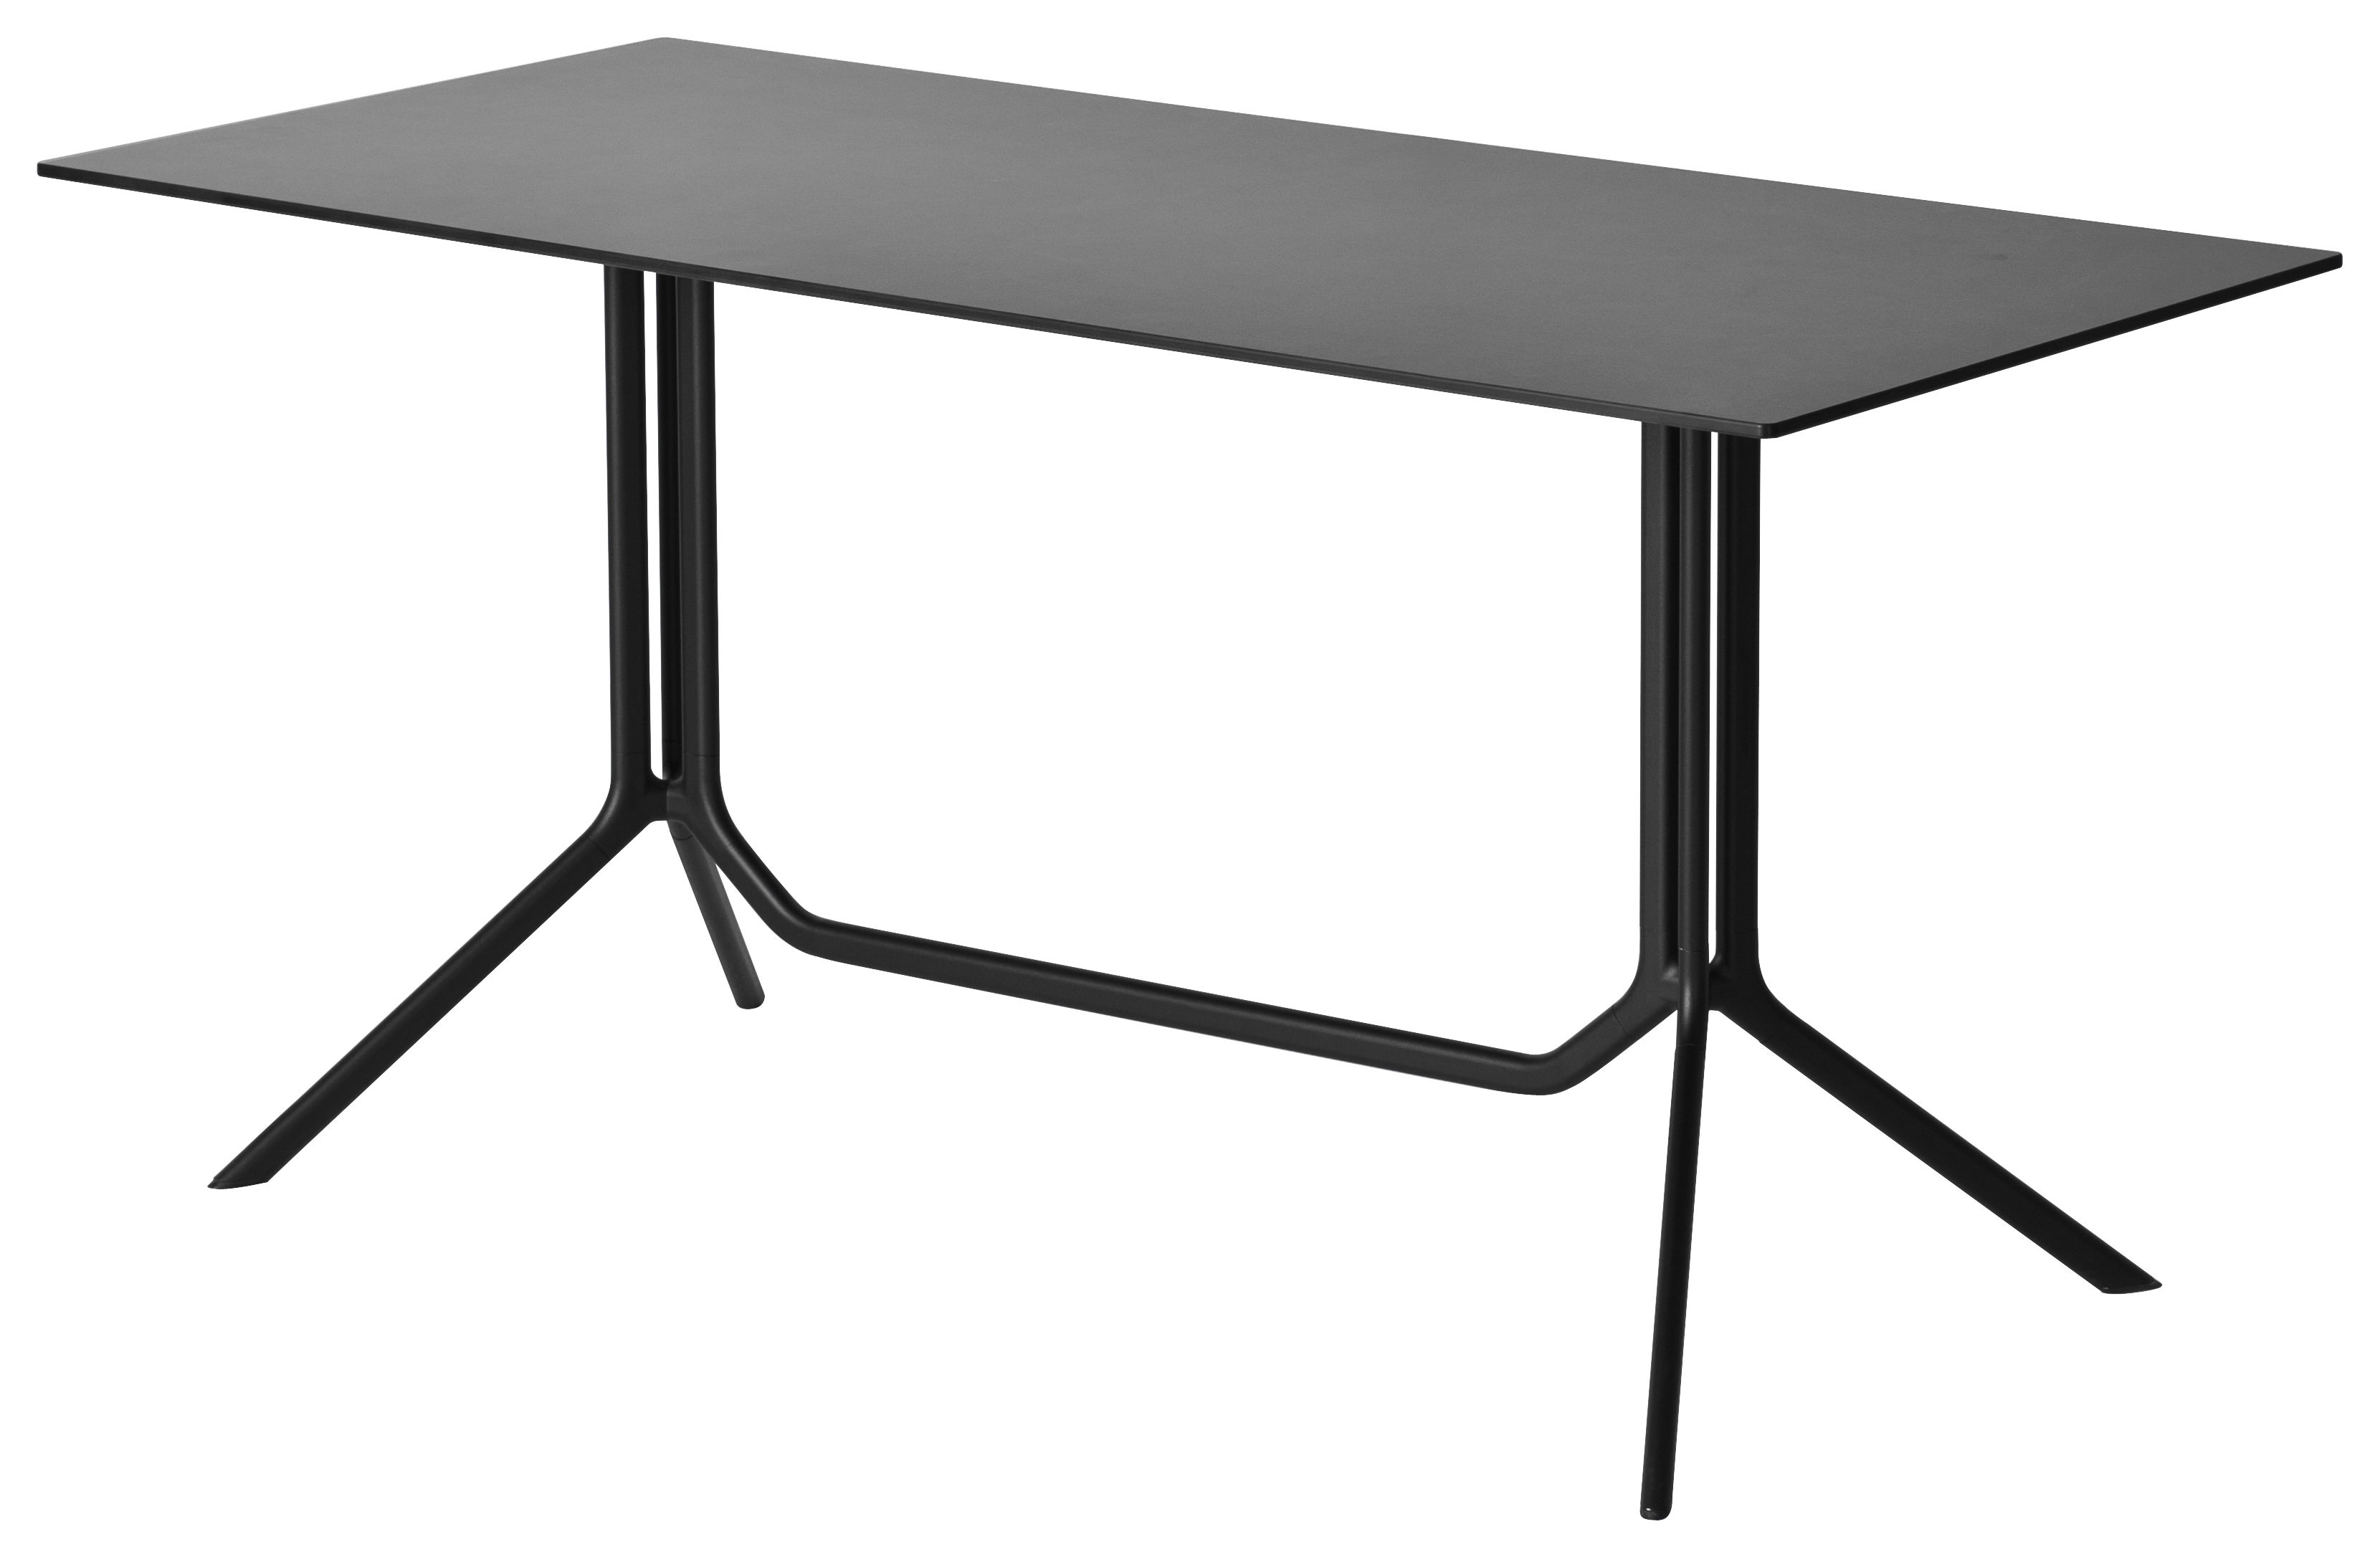 Poule double foldable table 120 x 60 cm foldable top for Table 60x120